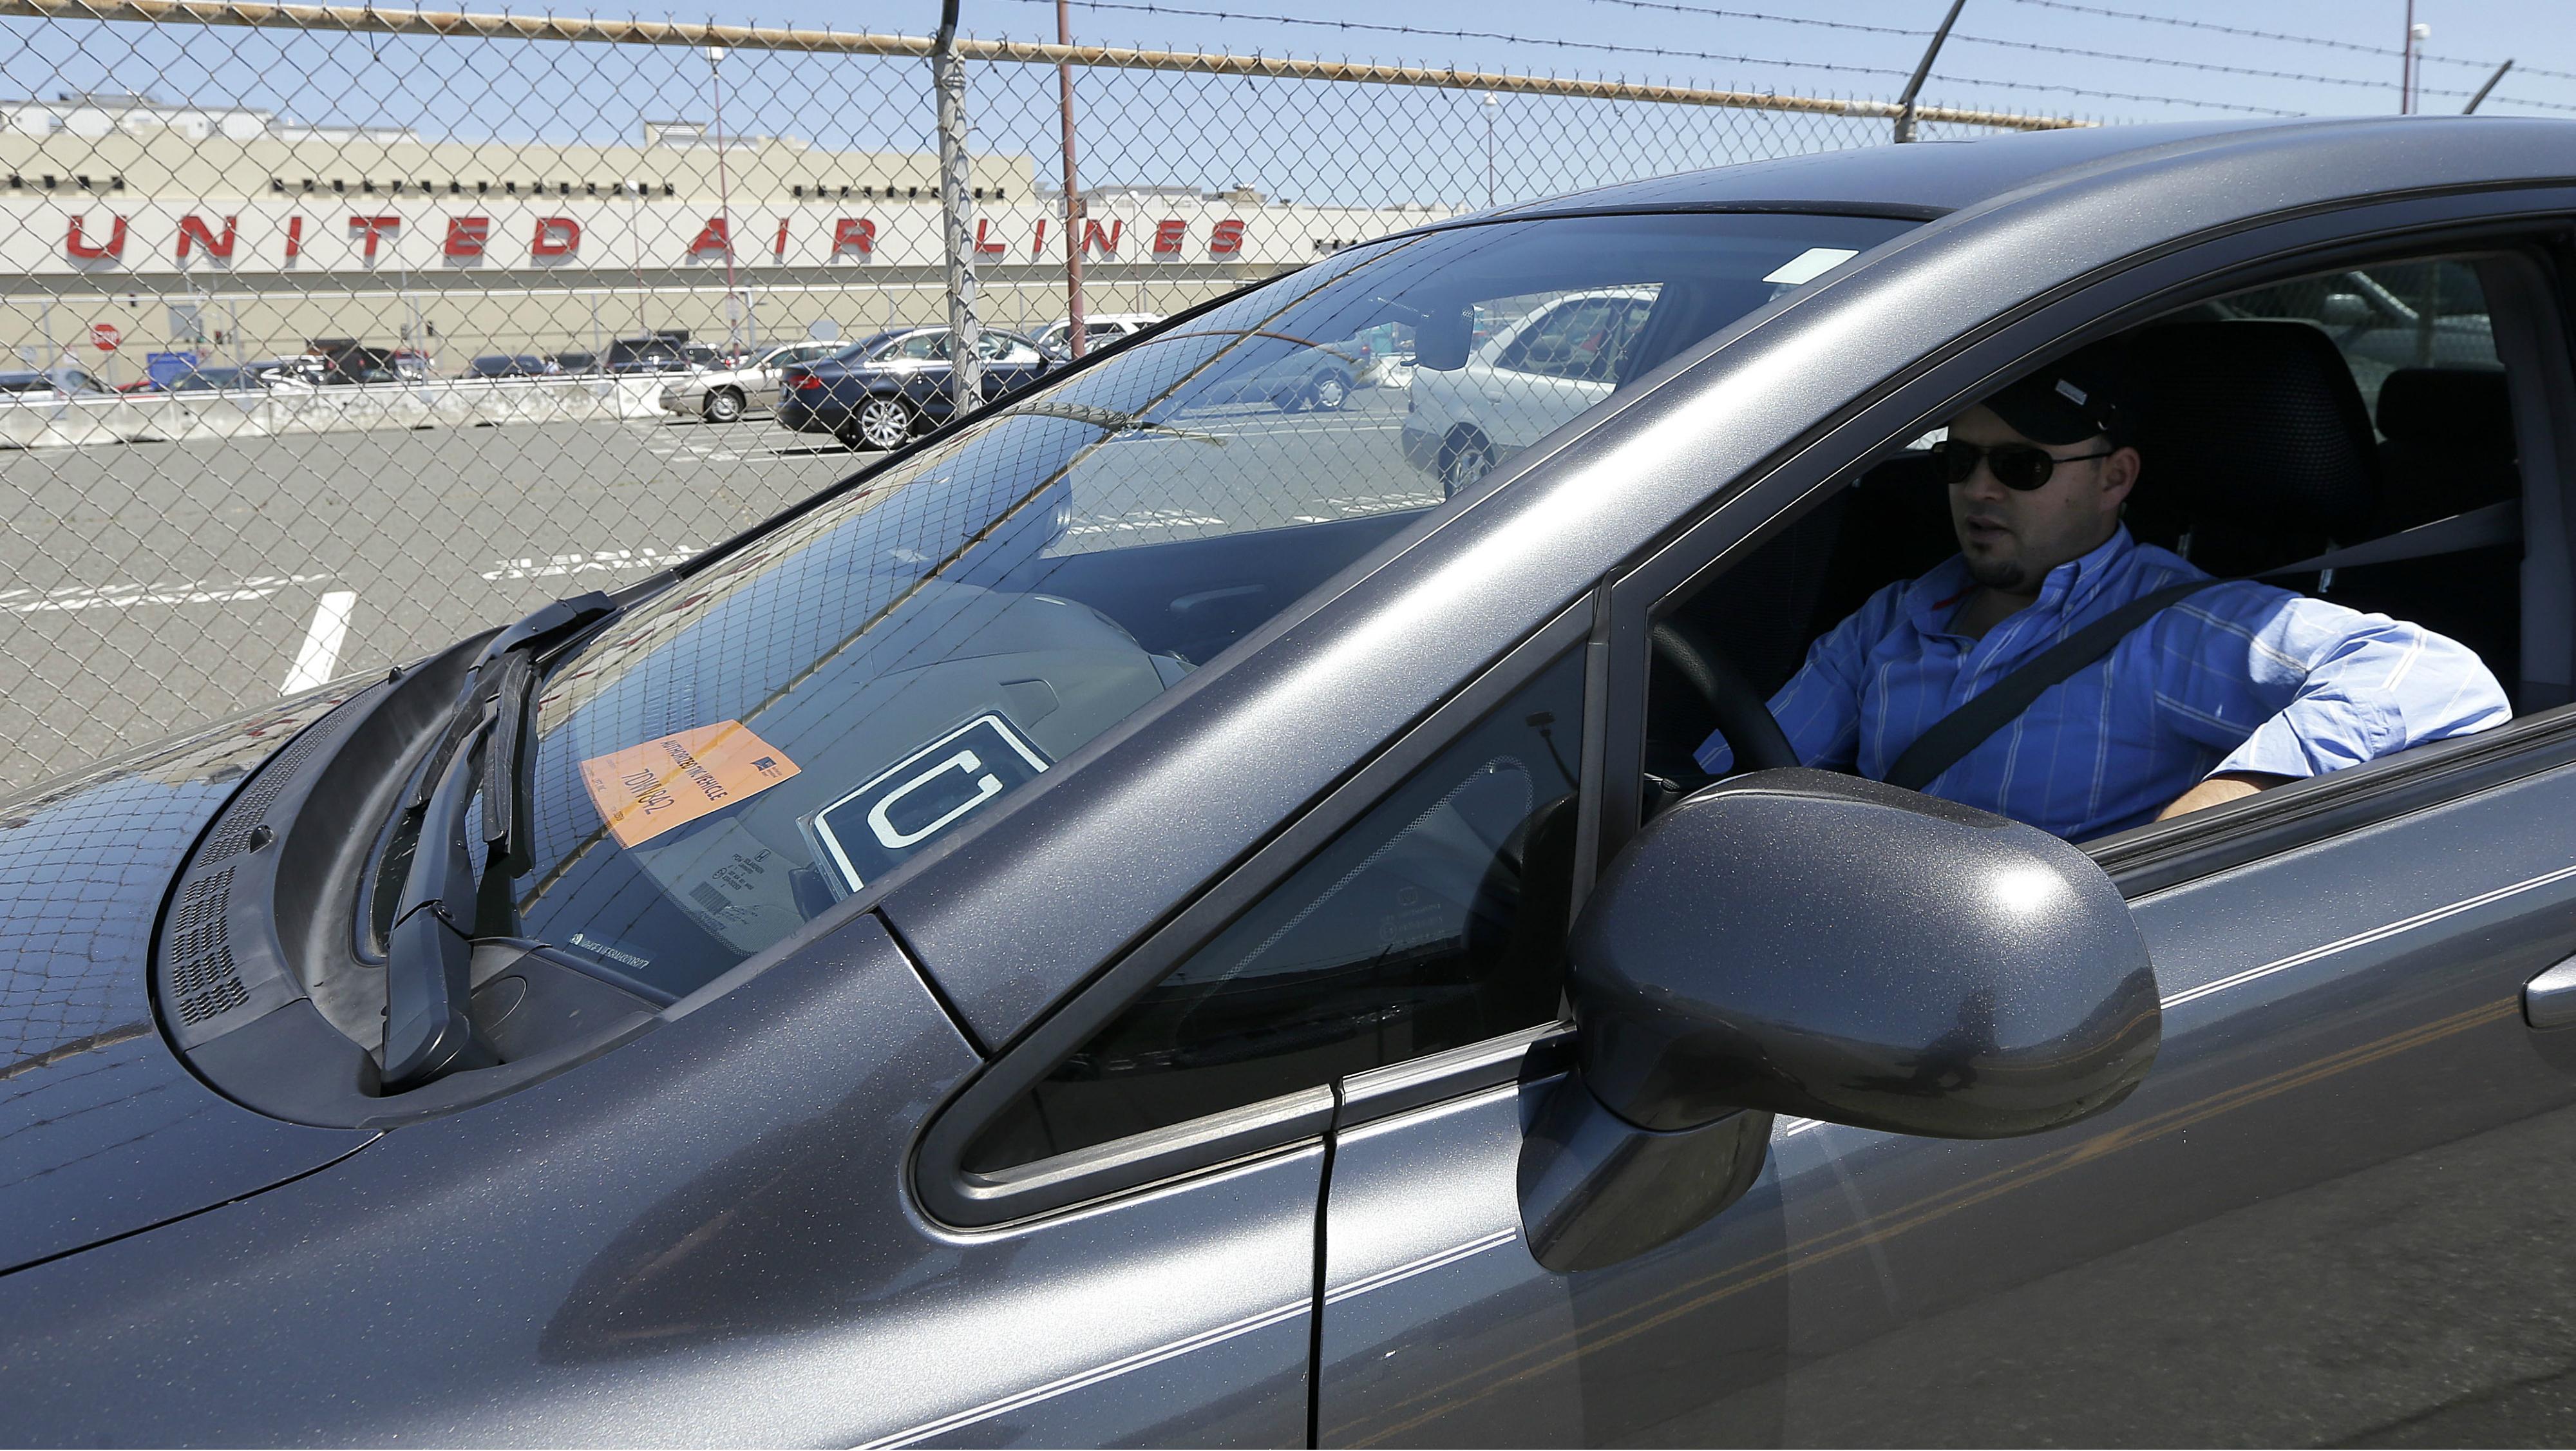 Uber s new car rental program with Enterprise doesn t make much